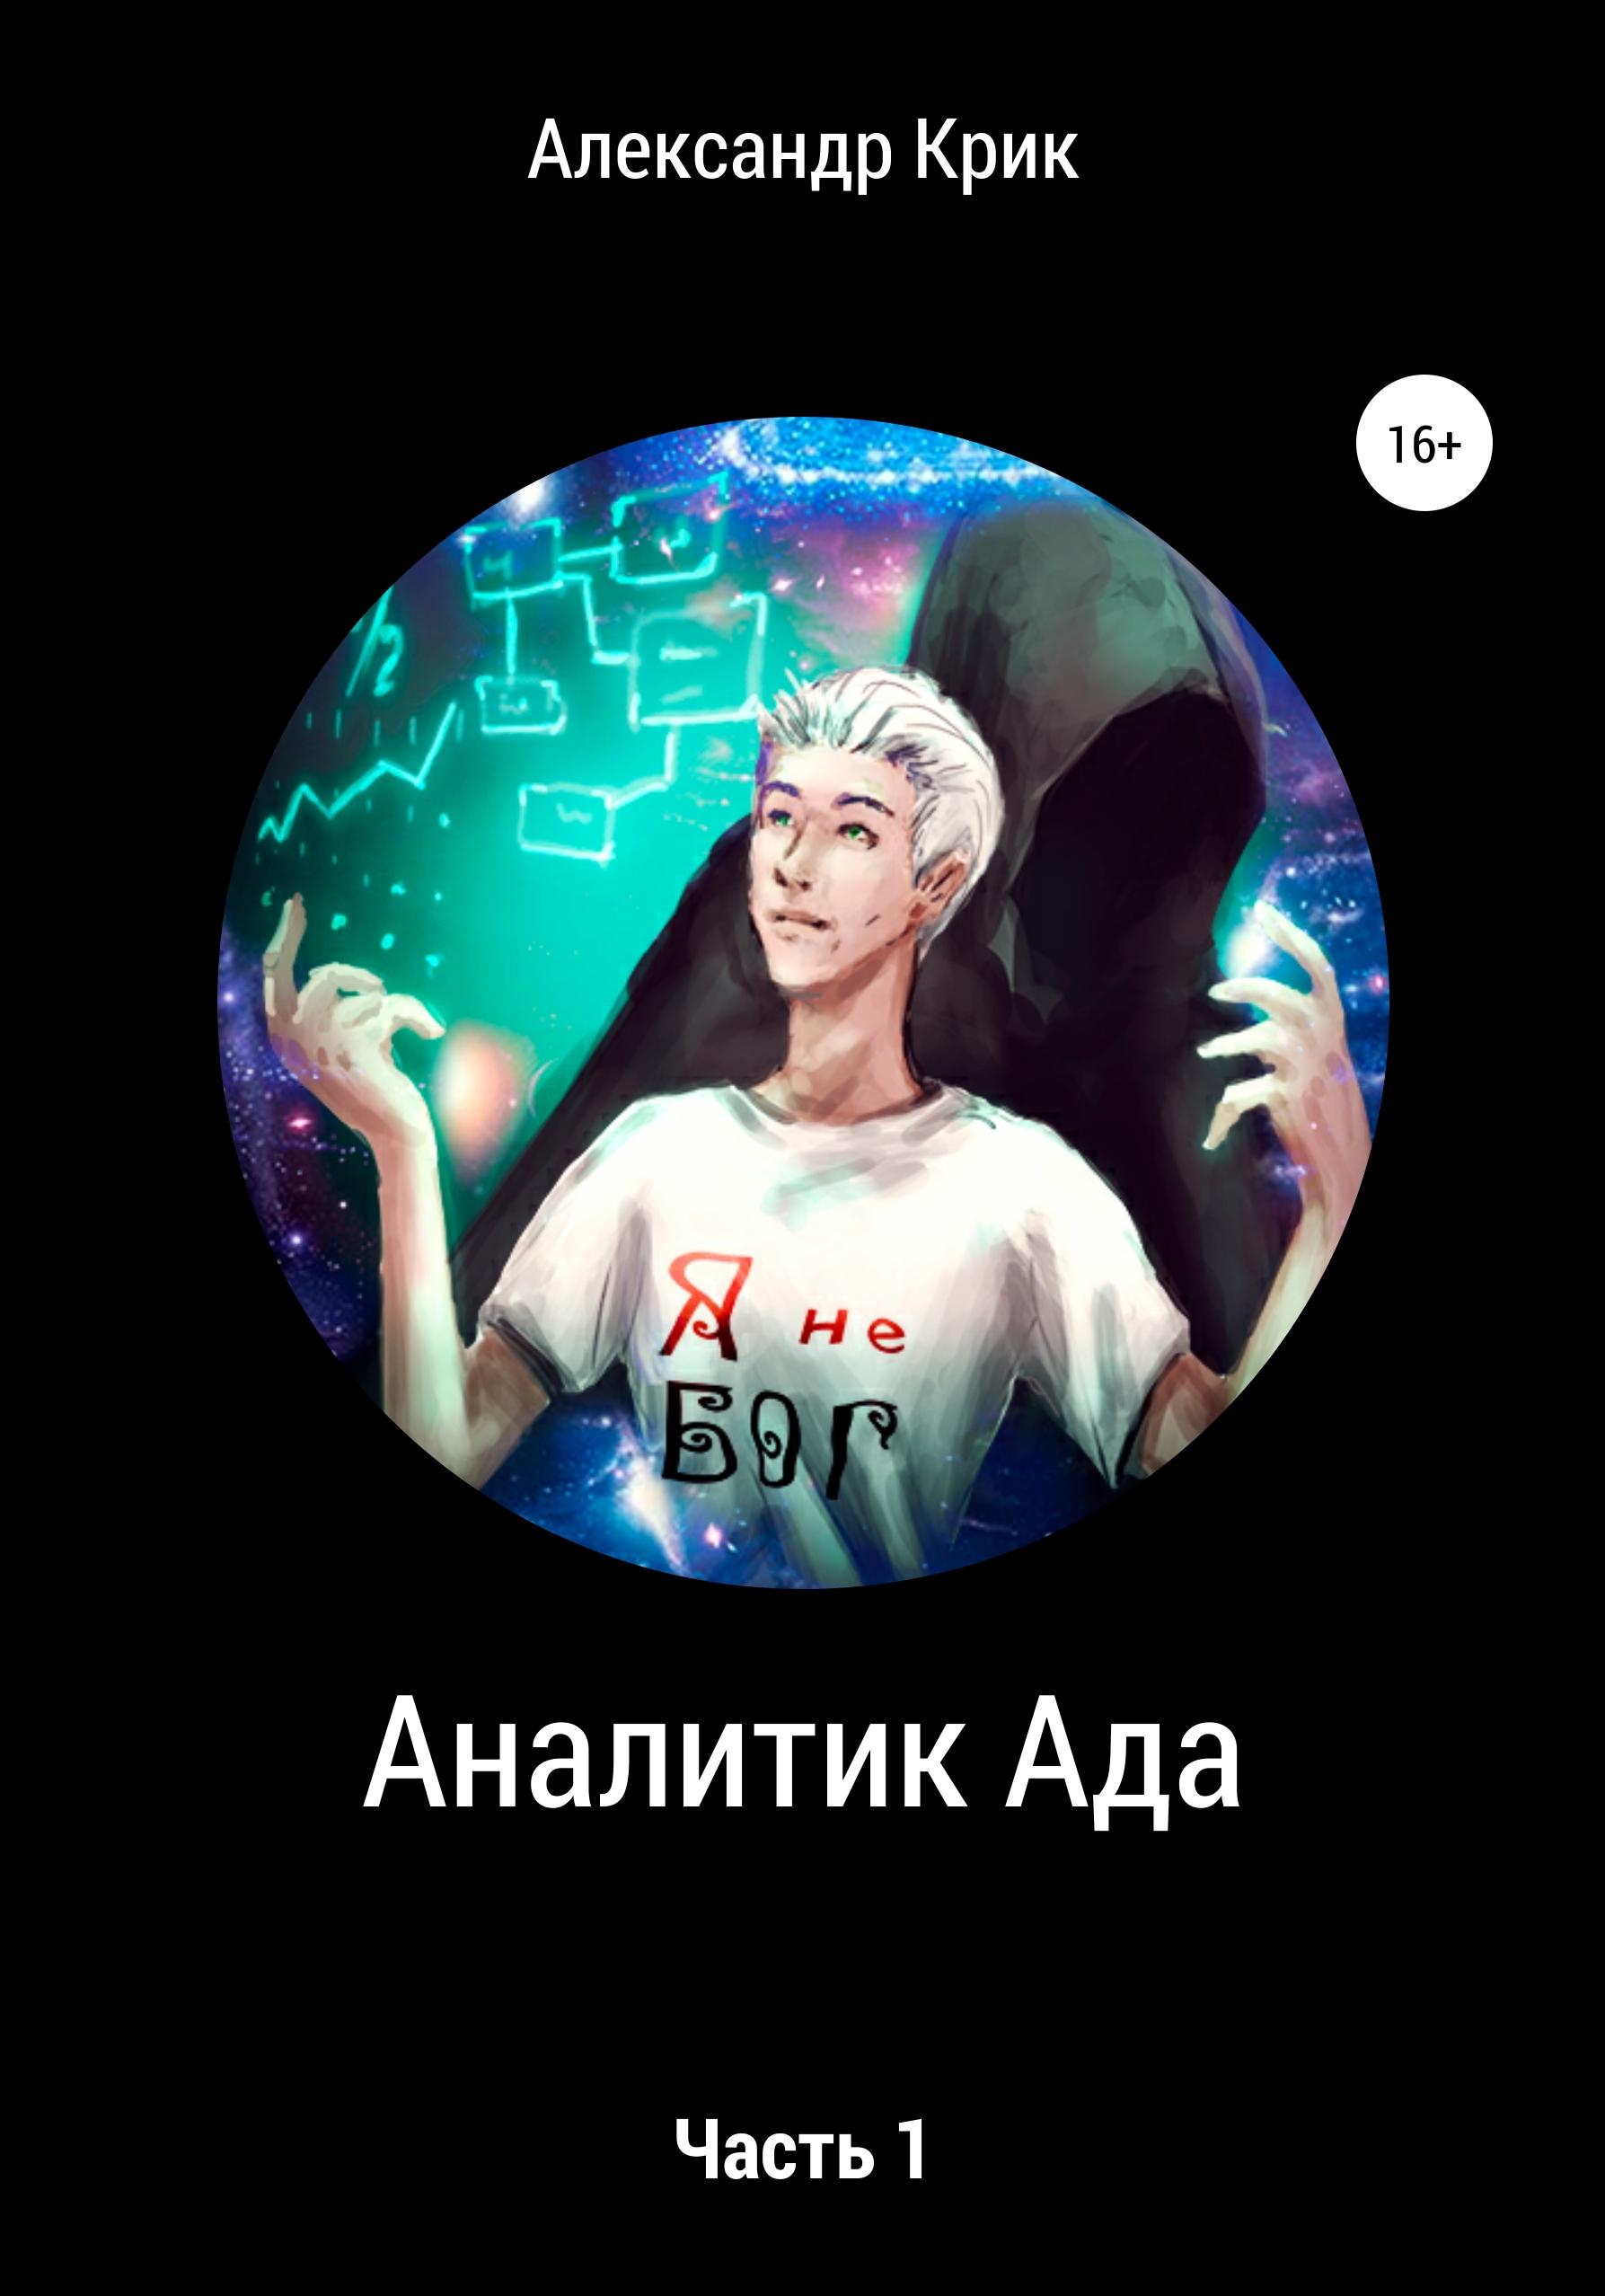 Александр Сметанников Аналитик Ада